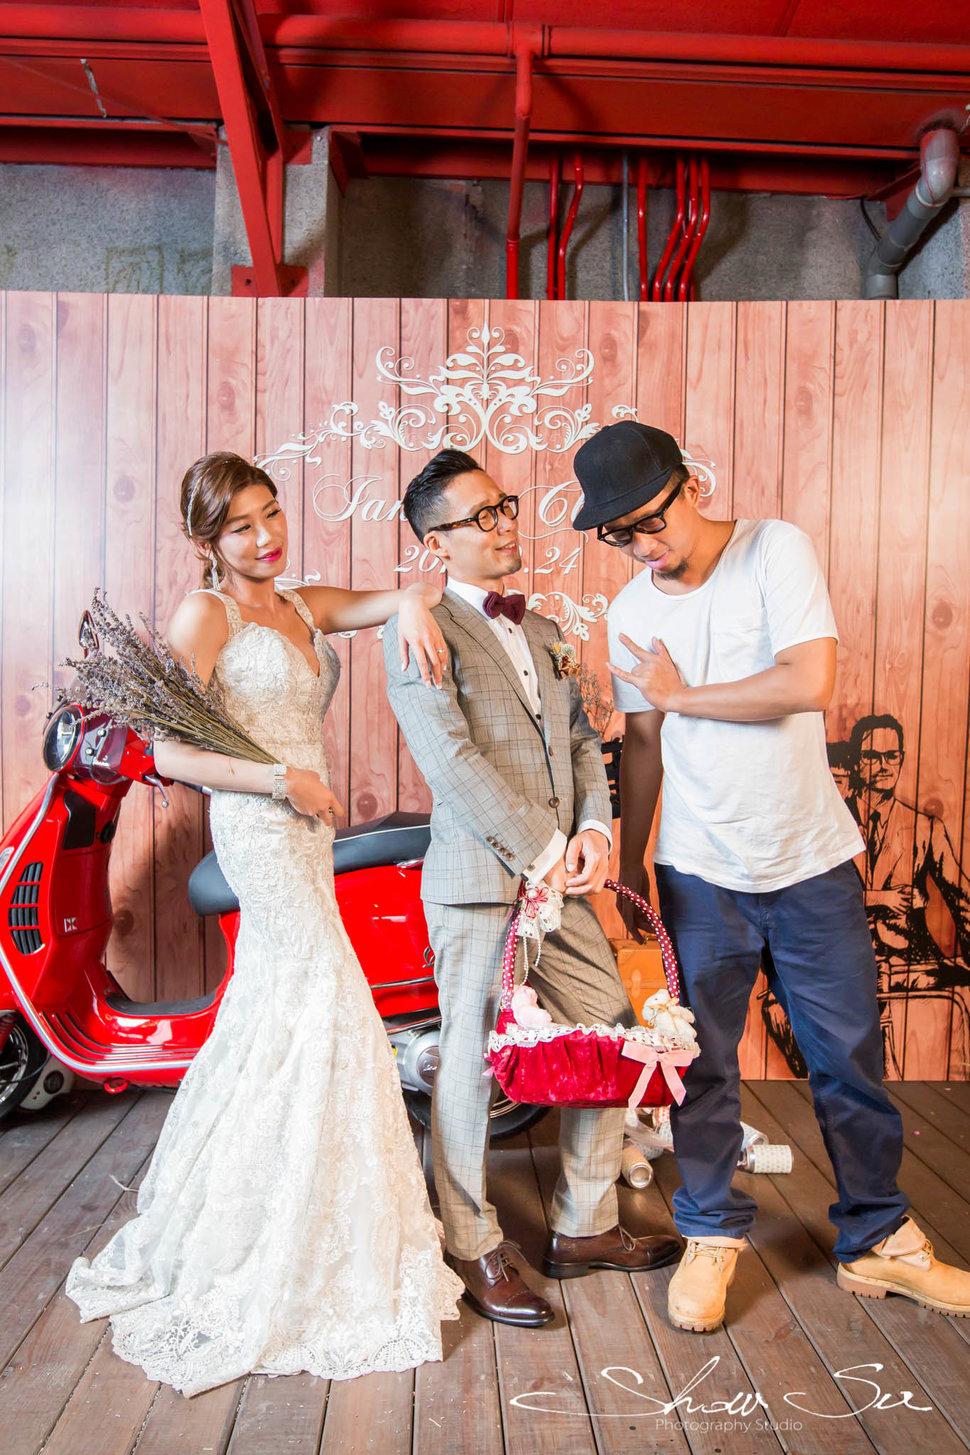 (編號:550291) - Show Su Photography - 結婚吧一站式婚禮服務平台